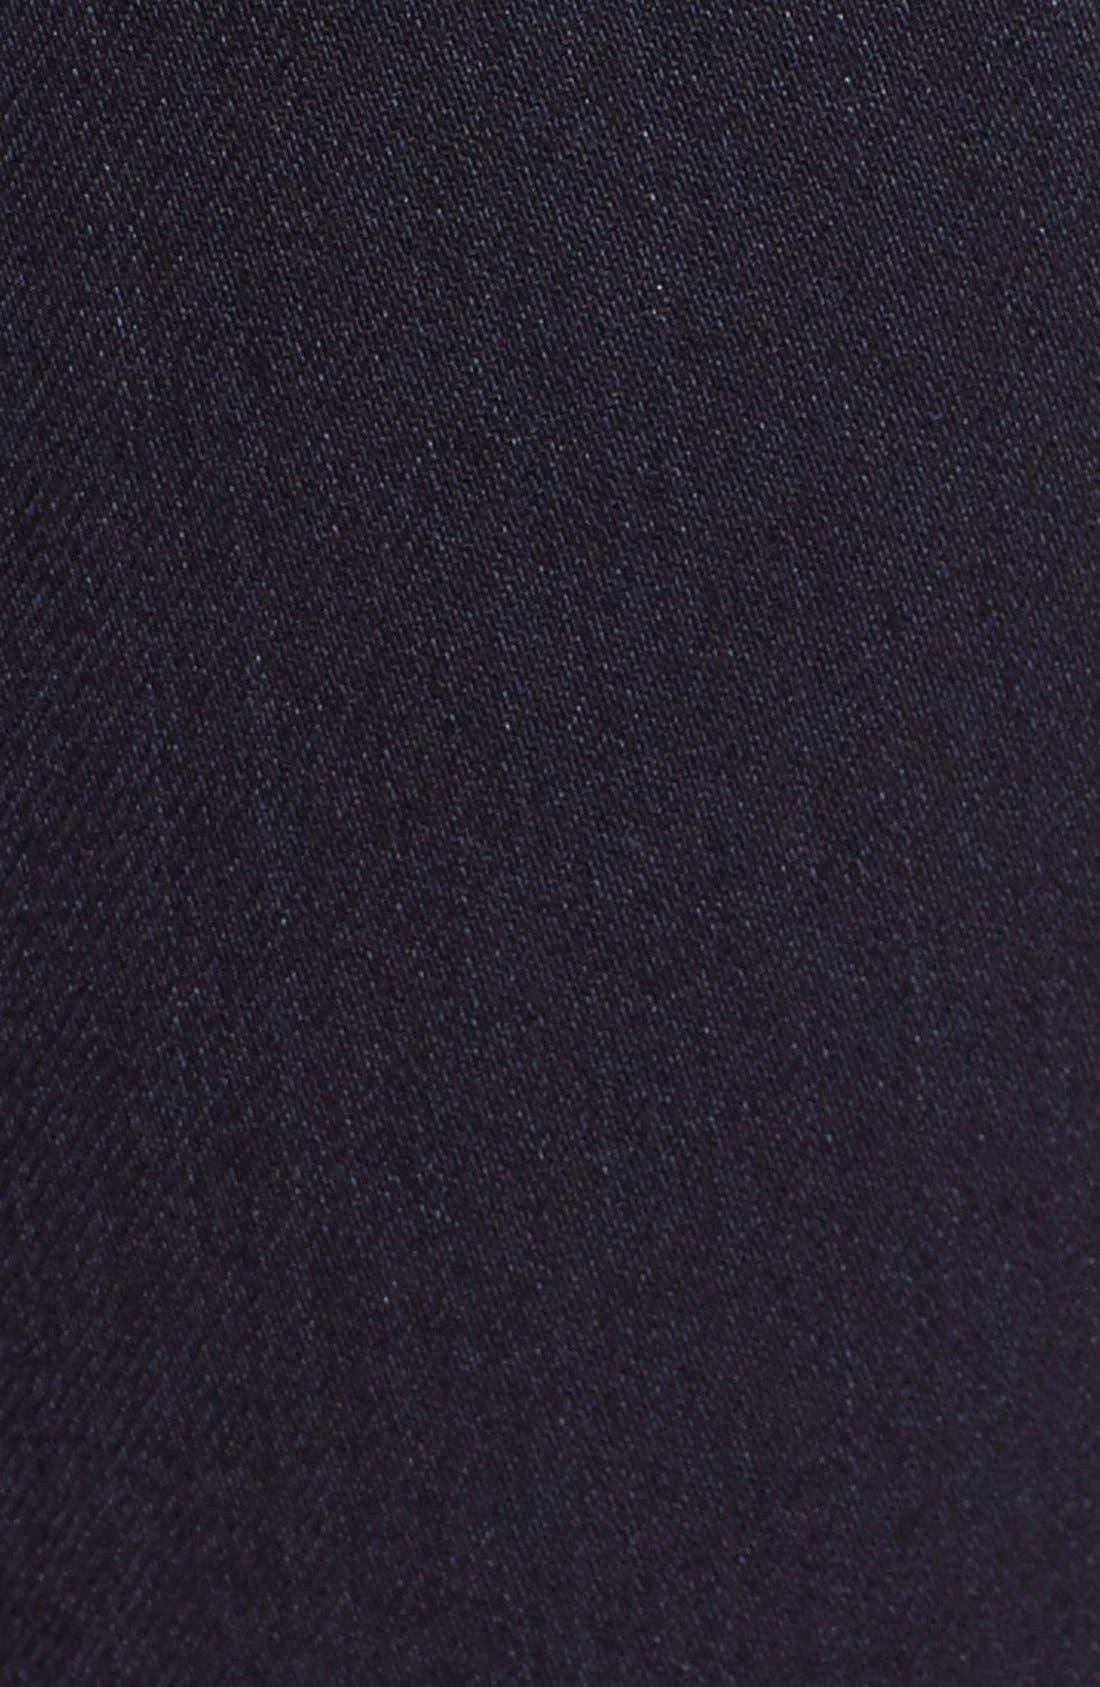 Denim 'Verdugo' Ultra Skinny Jeans,                             Alternate thumbnail 3, color,                             400